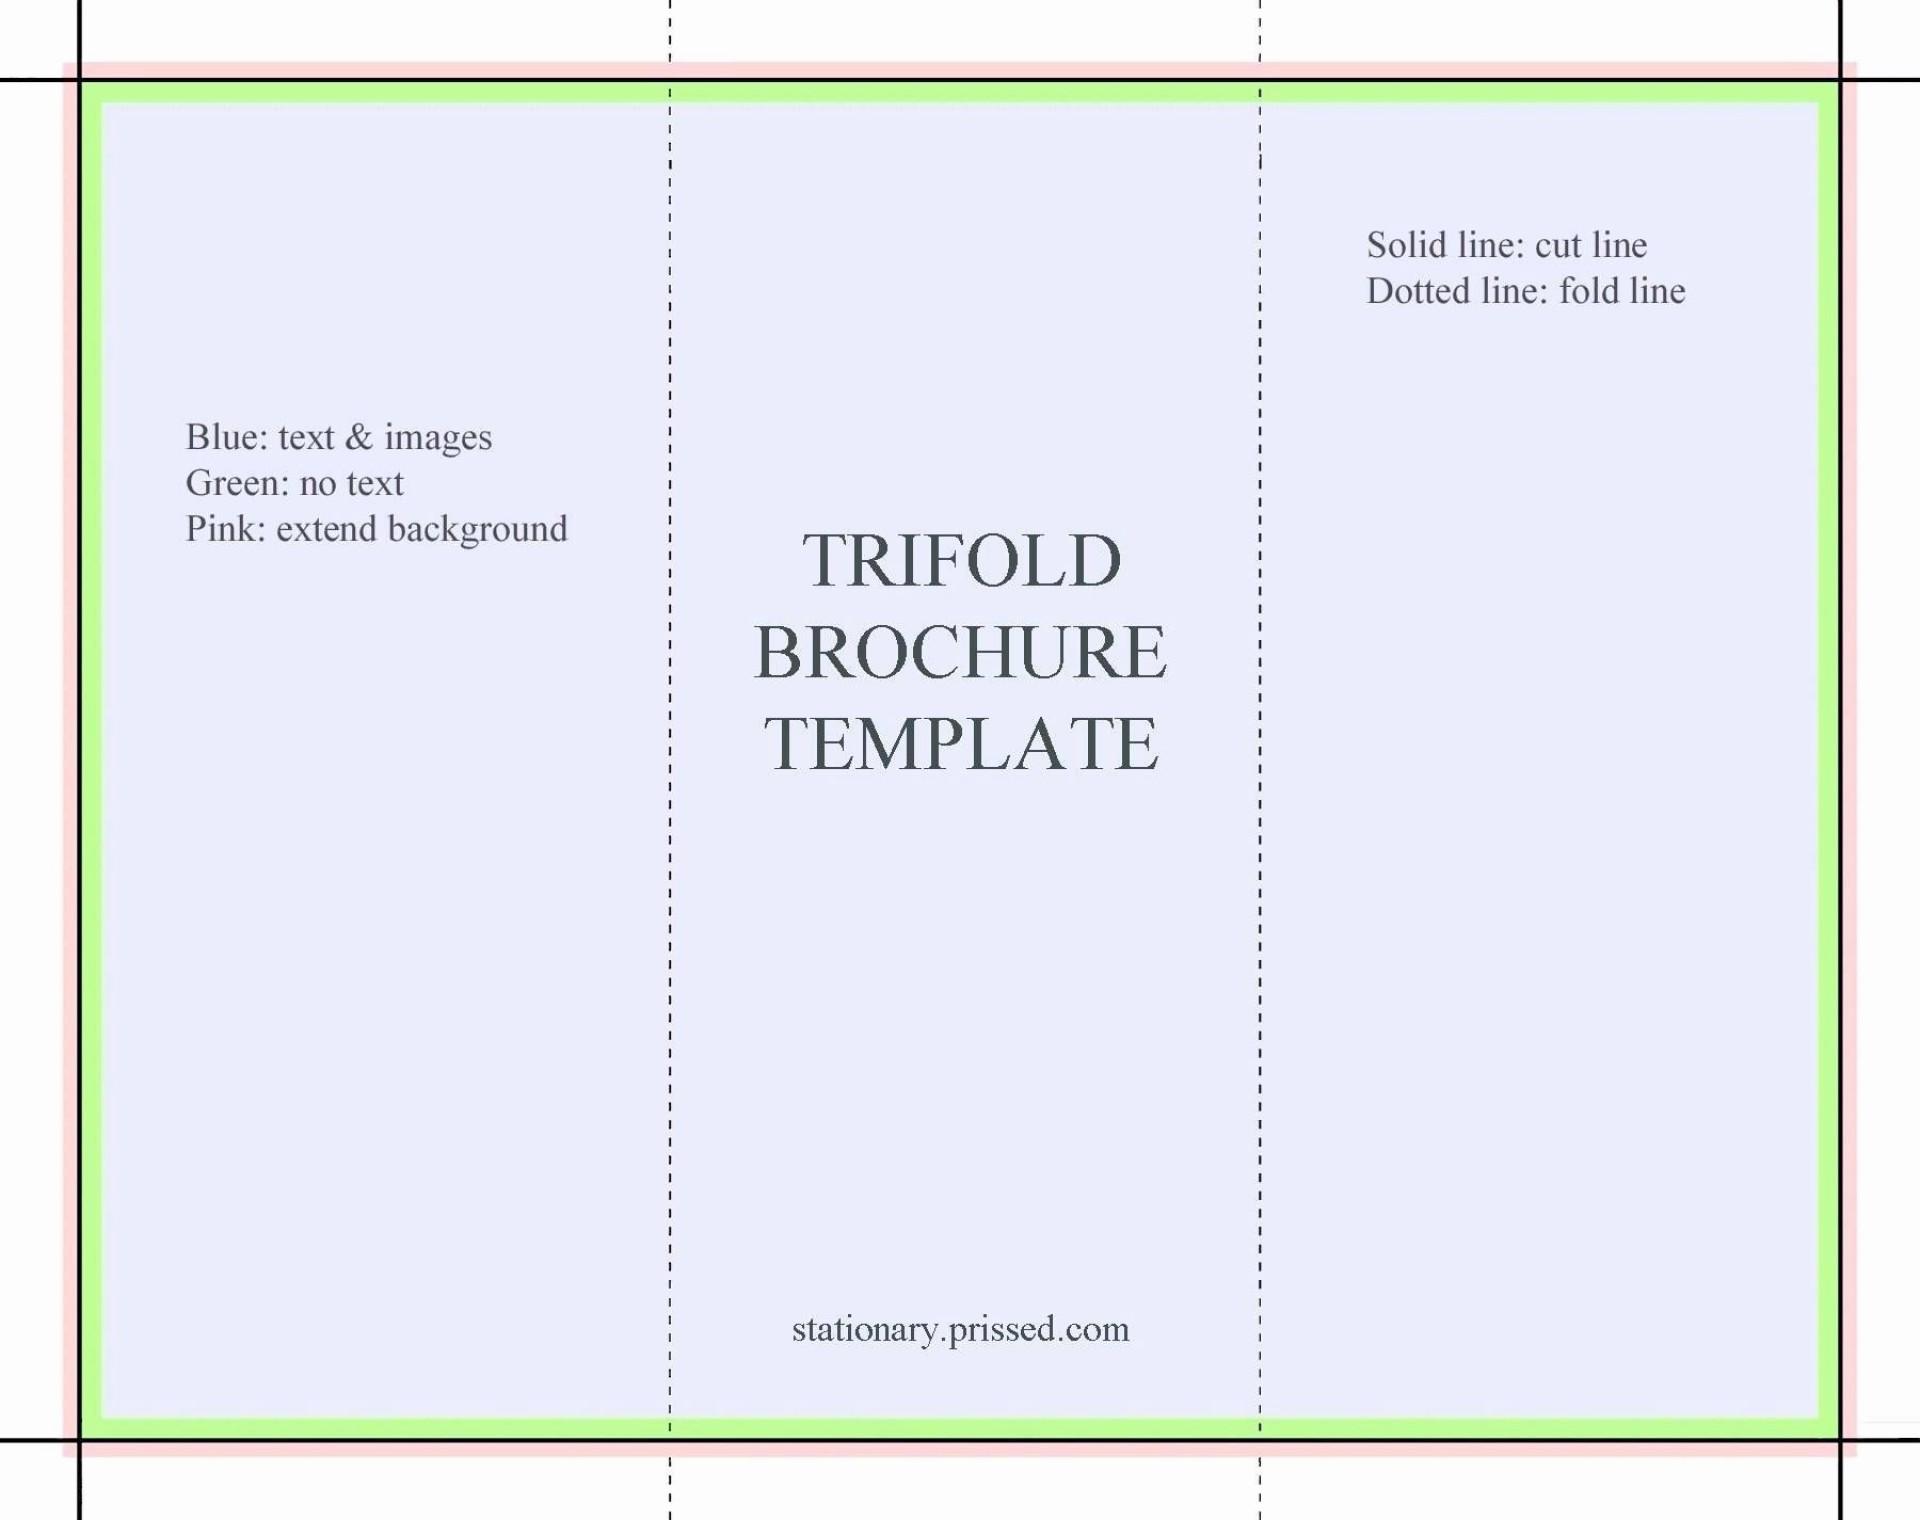 000 Frightening Brochure Template Google Doc Idea  Layout Blank Tri Fold1920